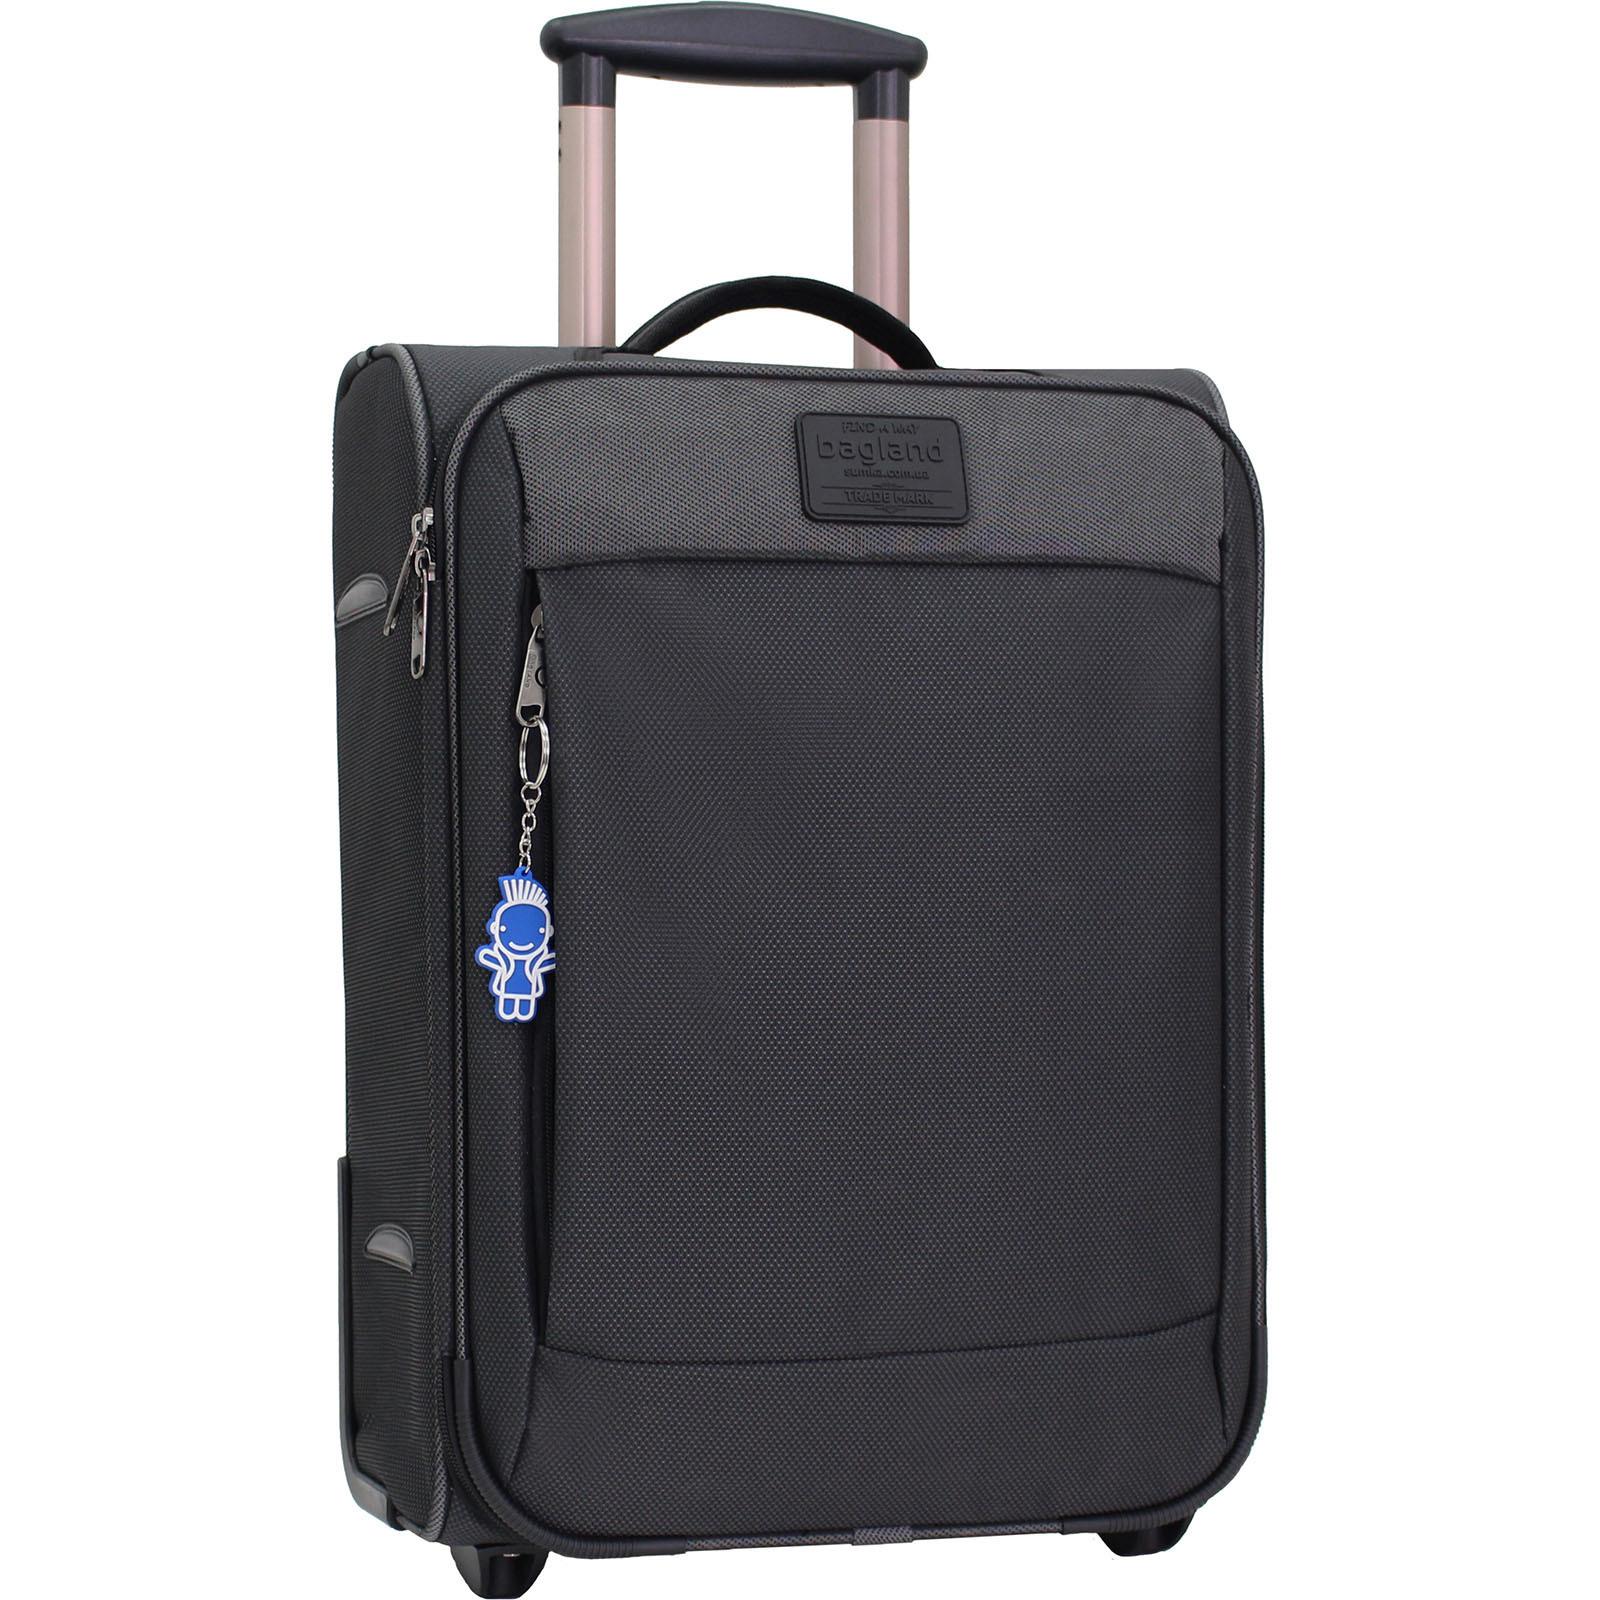 Дорожные чемоданы Чемодан Bagland Vichenzo 30 л. Чёрный (0037616919) IMG_1351.JPG